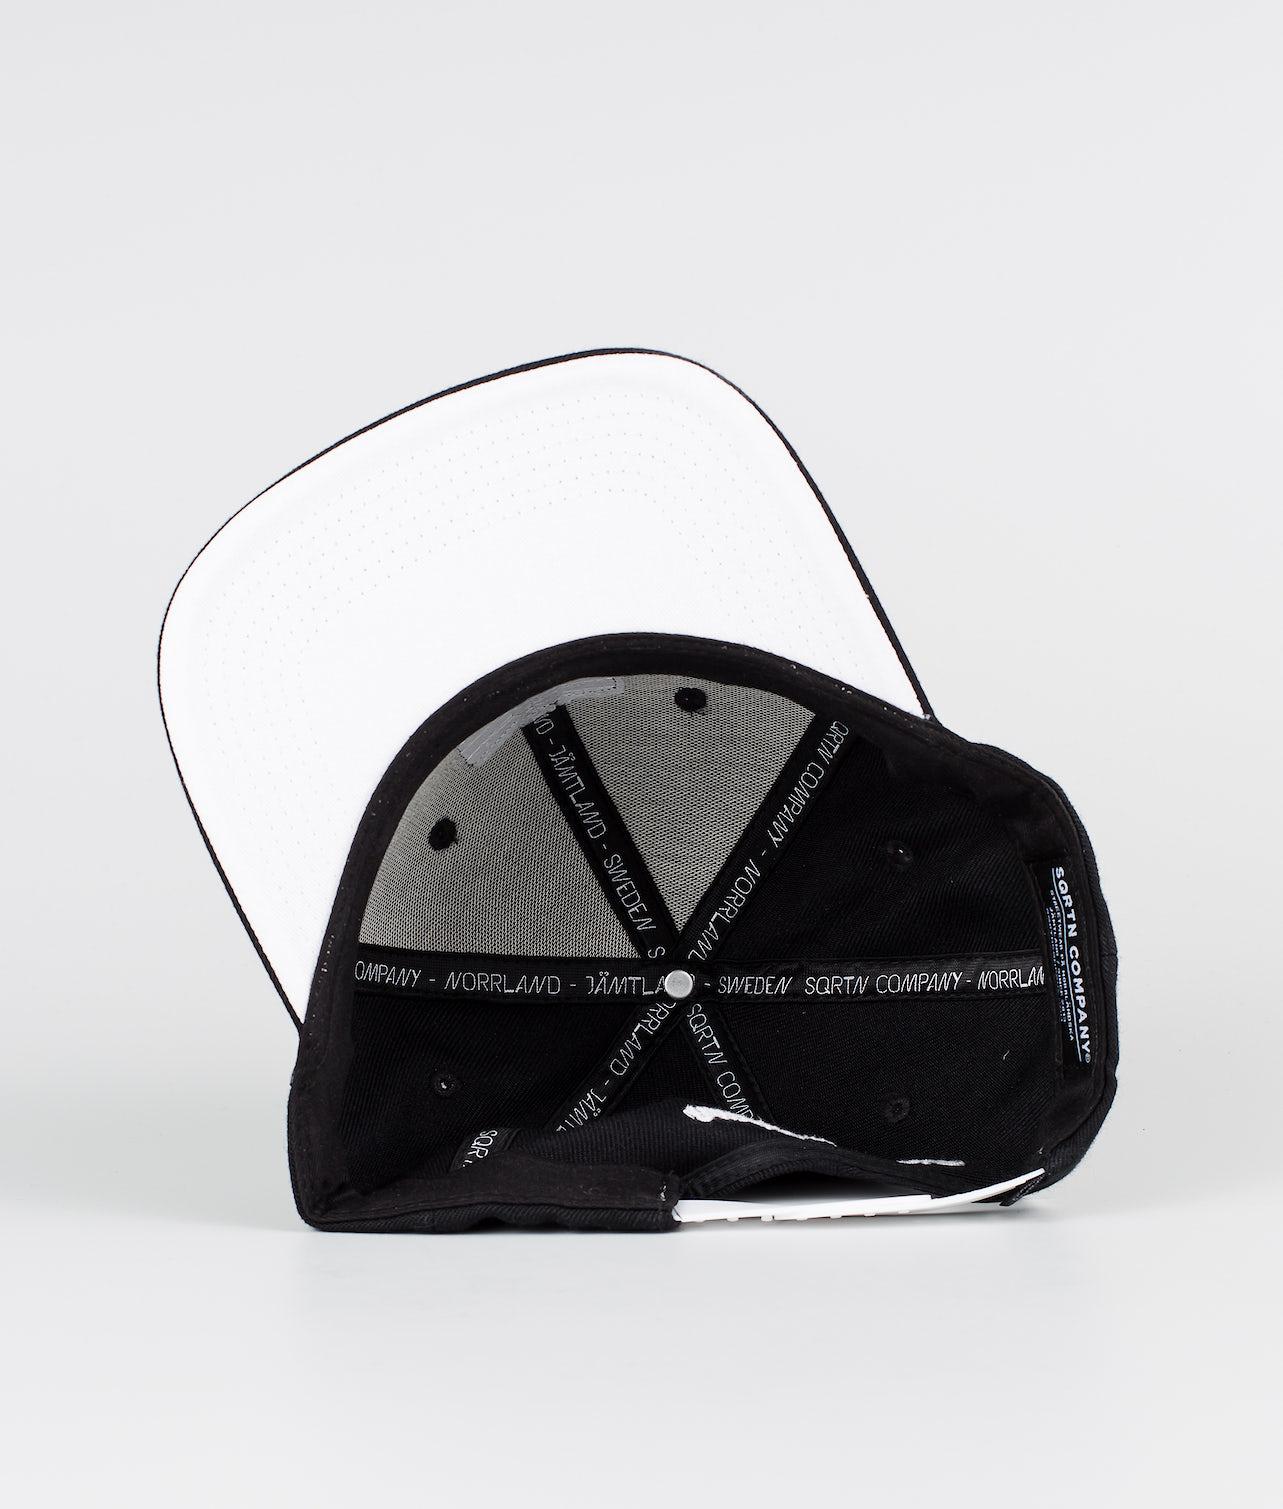 SQRTN Stock Caps Black